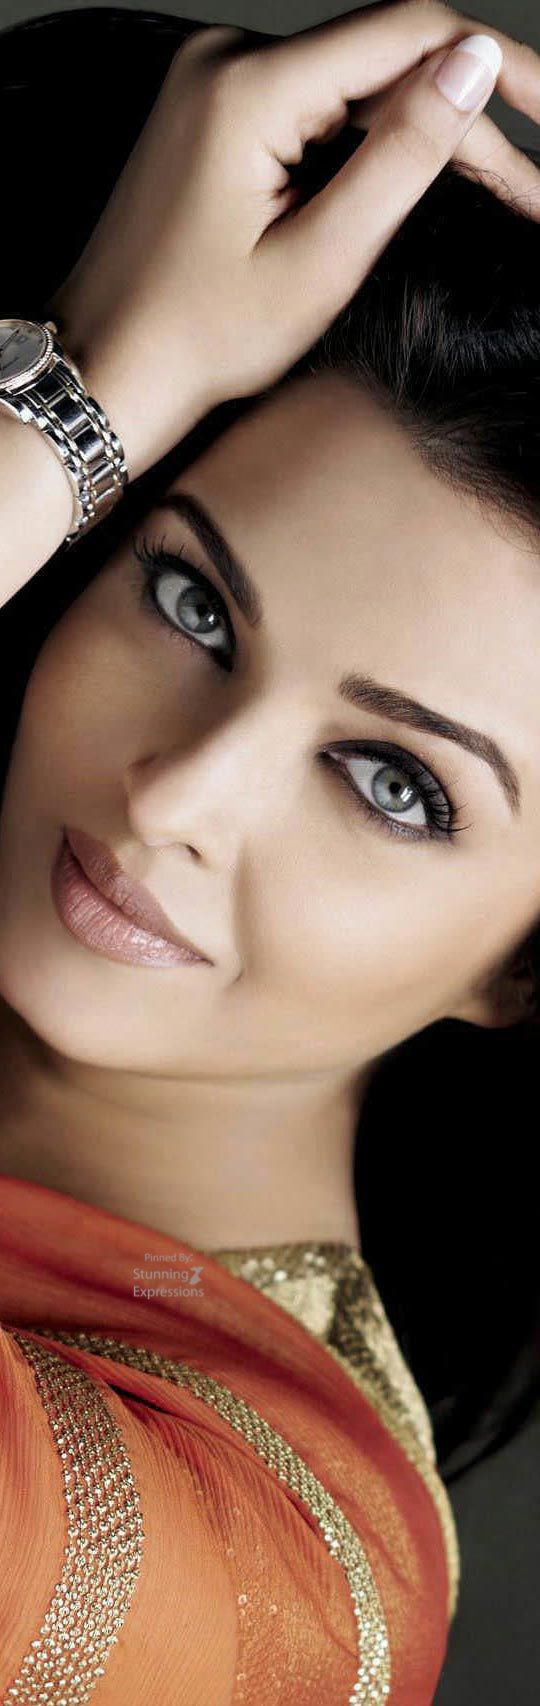 Apologise, aishwarya rai most beautiful woman pics are